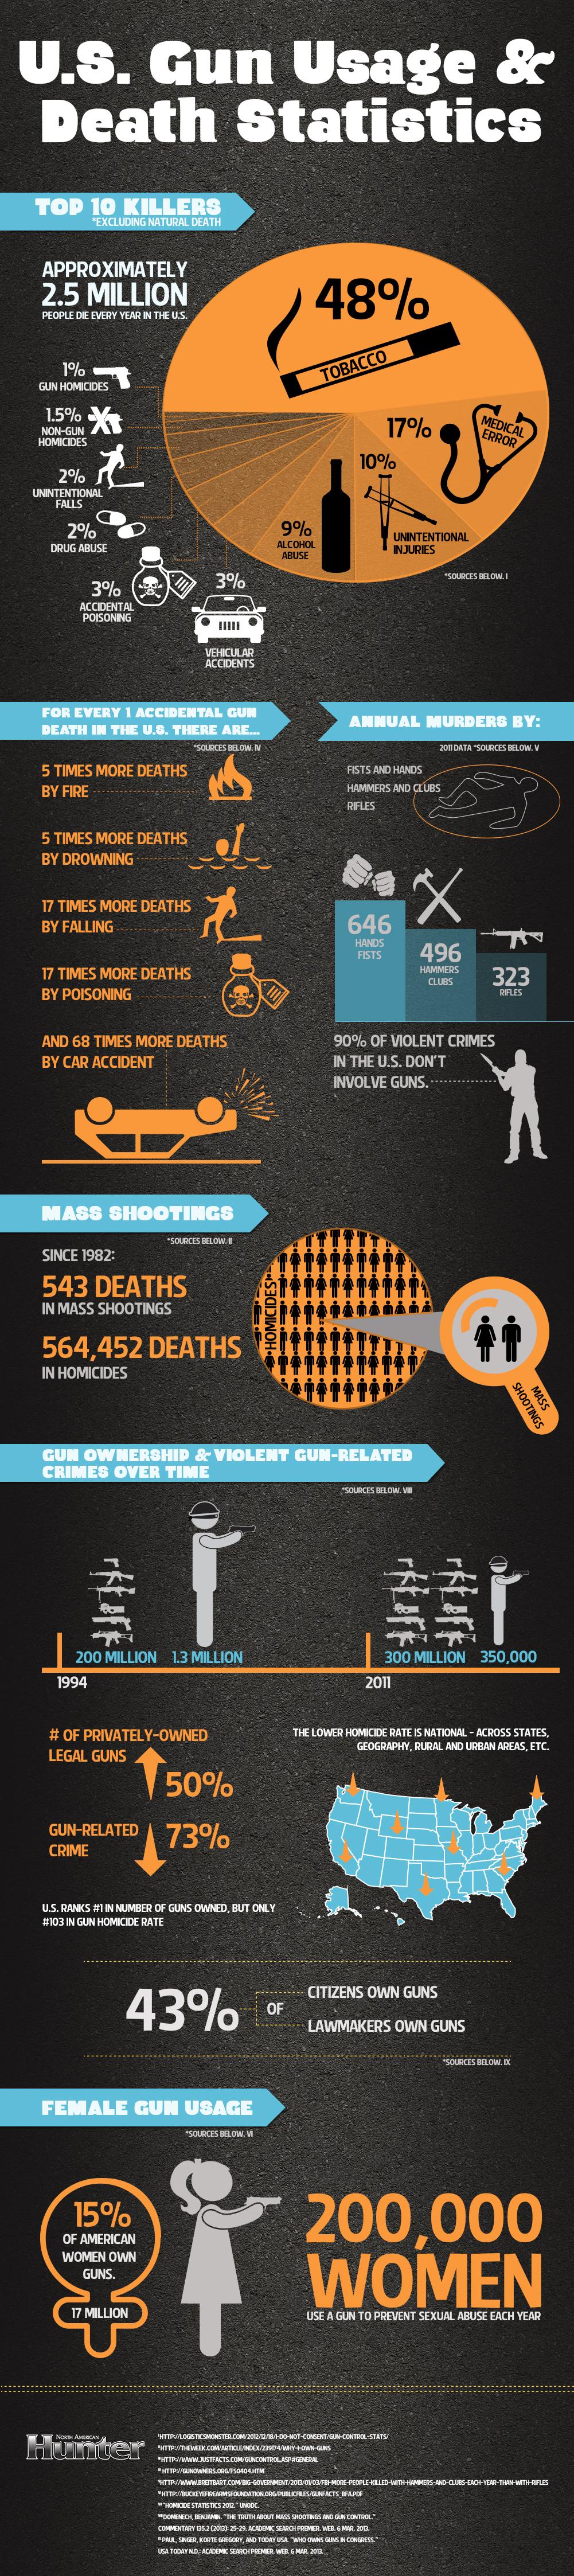 U.S. Gun Usage & Death Statistics]